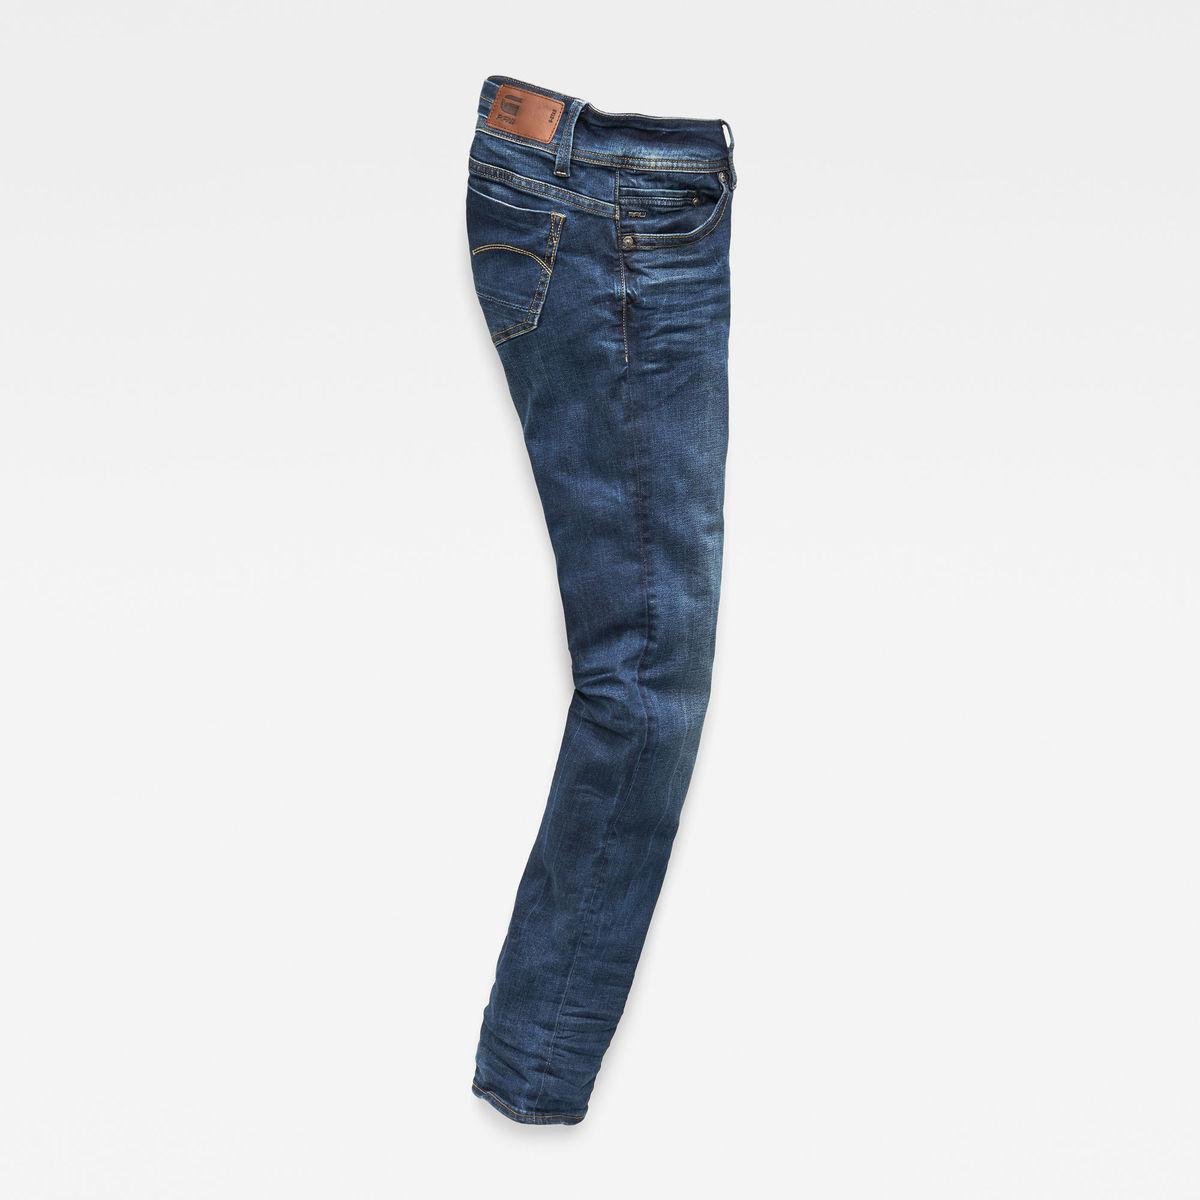 Bild 5 von Midge Saddle Mid Waist Straight Jeans